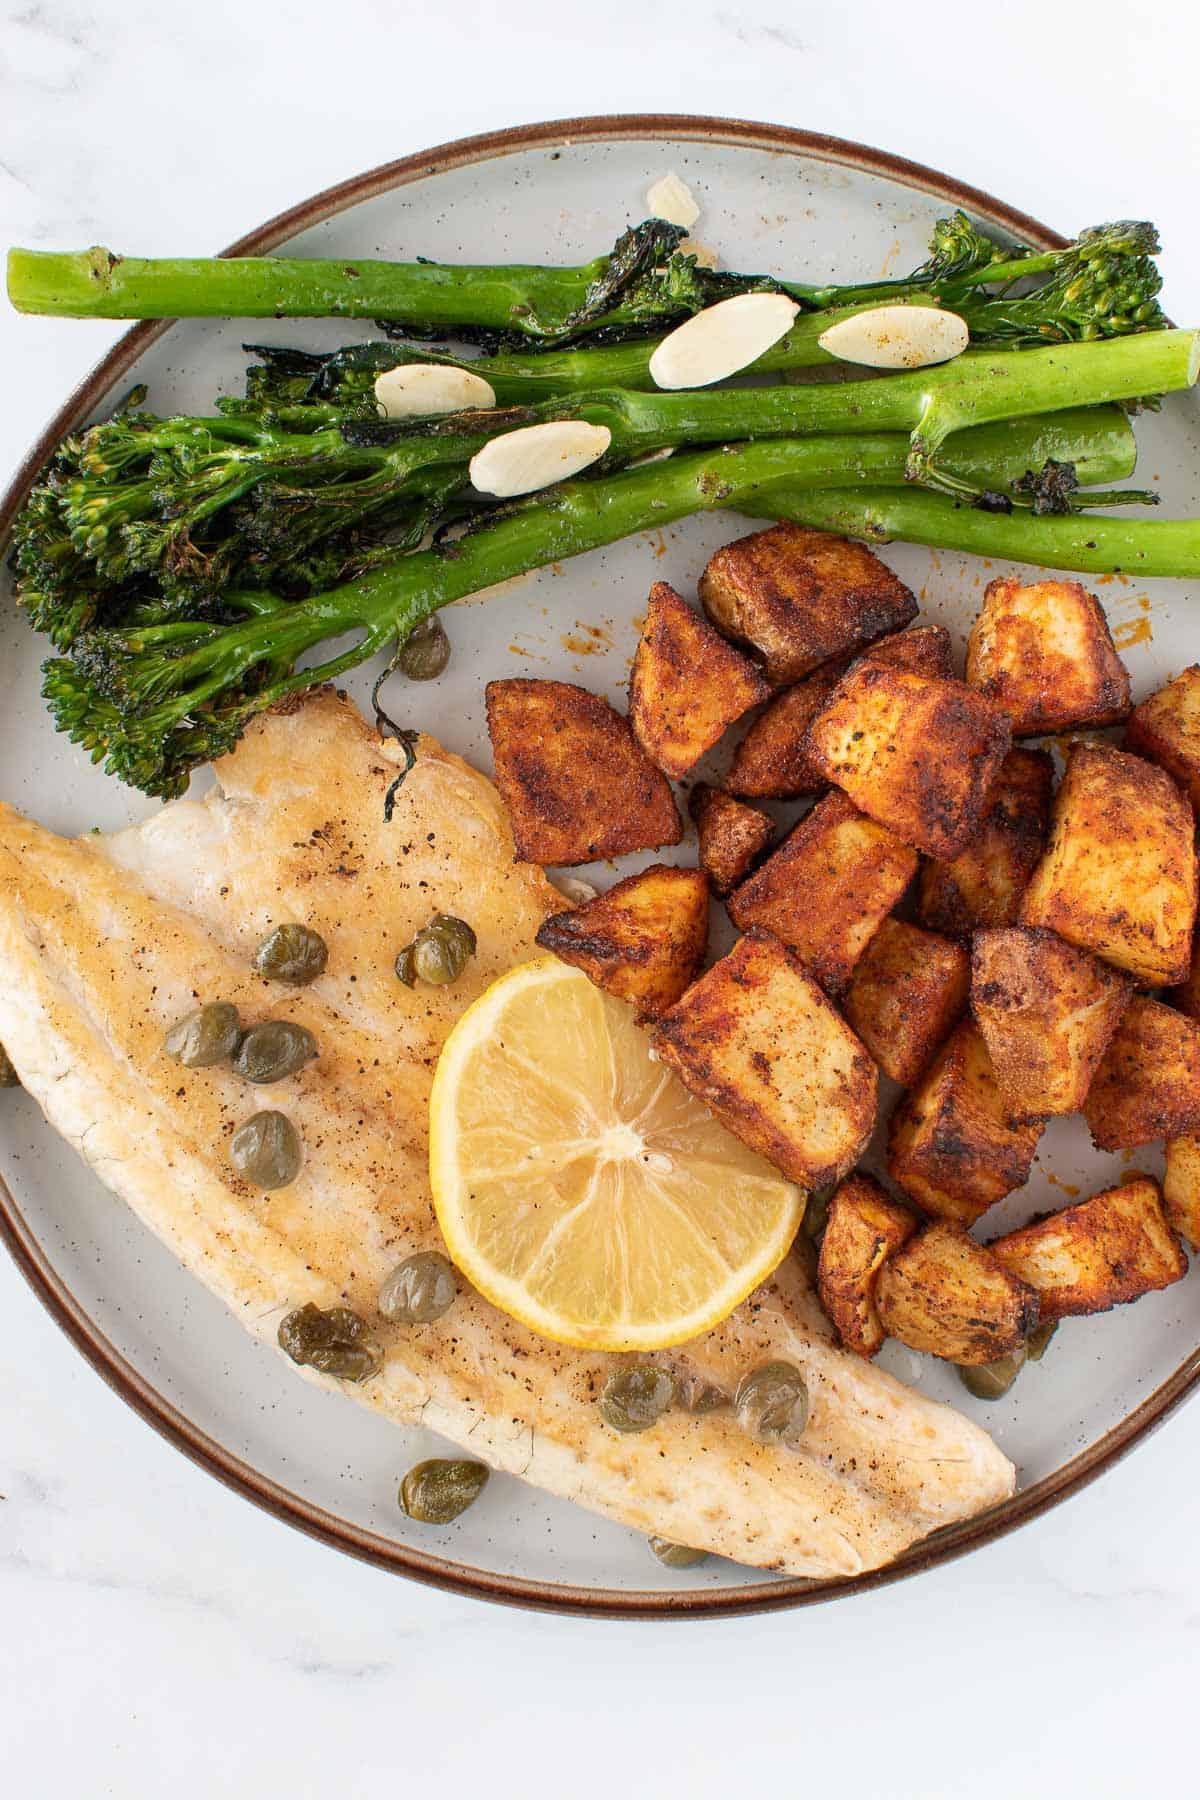 Sea bass, potatoes and broccoli on a plate.